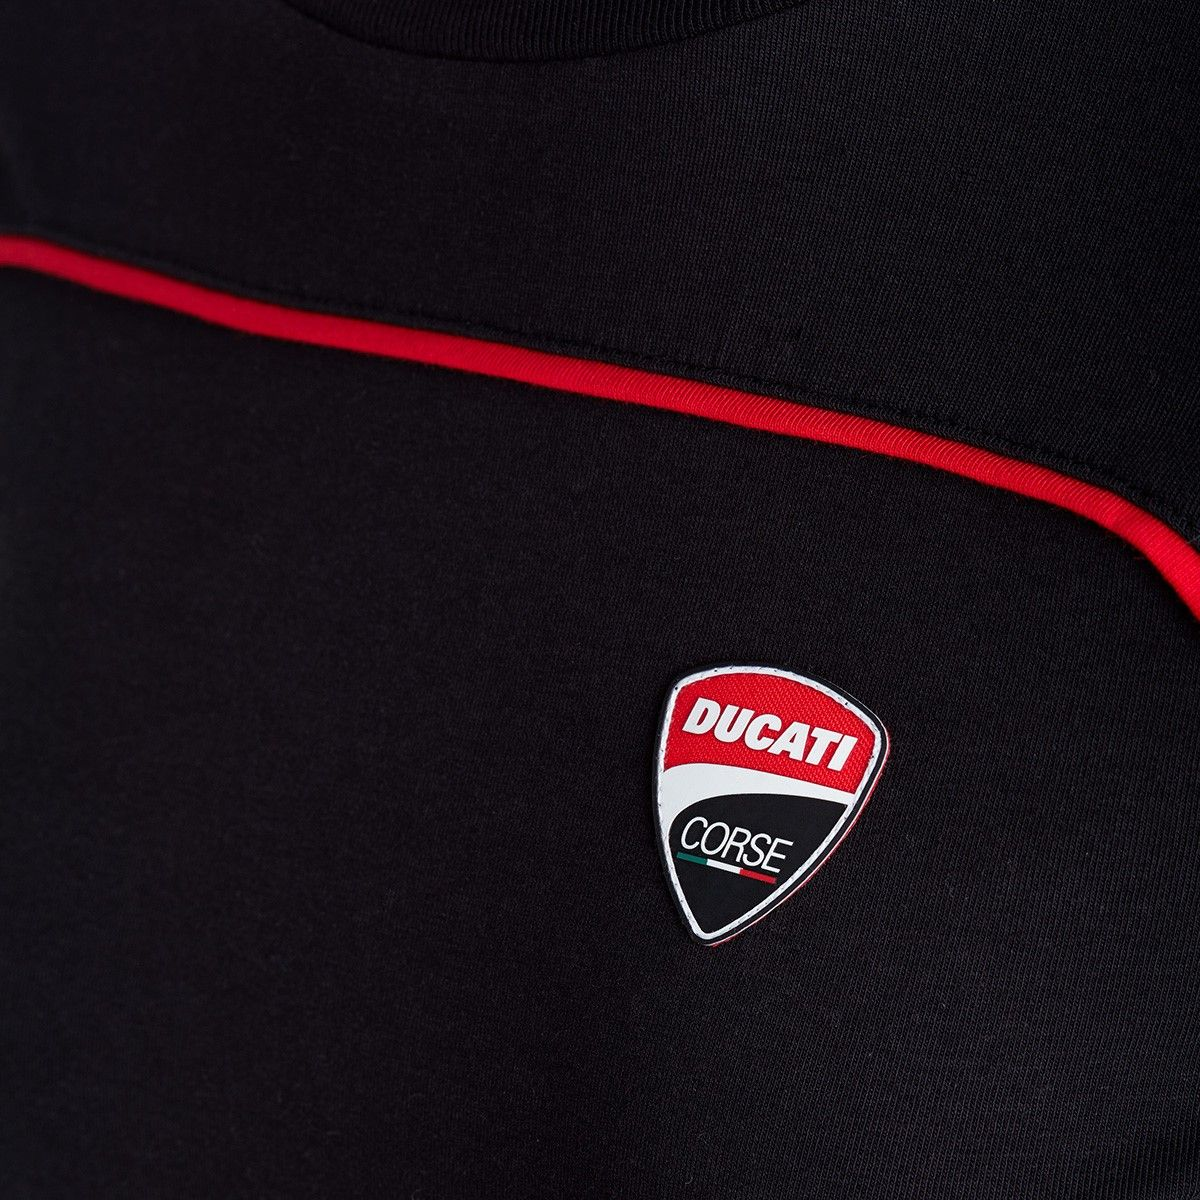 【DUCATI performance】Ducati Corse Speed  女用 T恤 - 「Webike-摩托百貨」